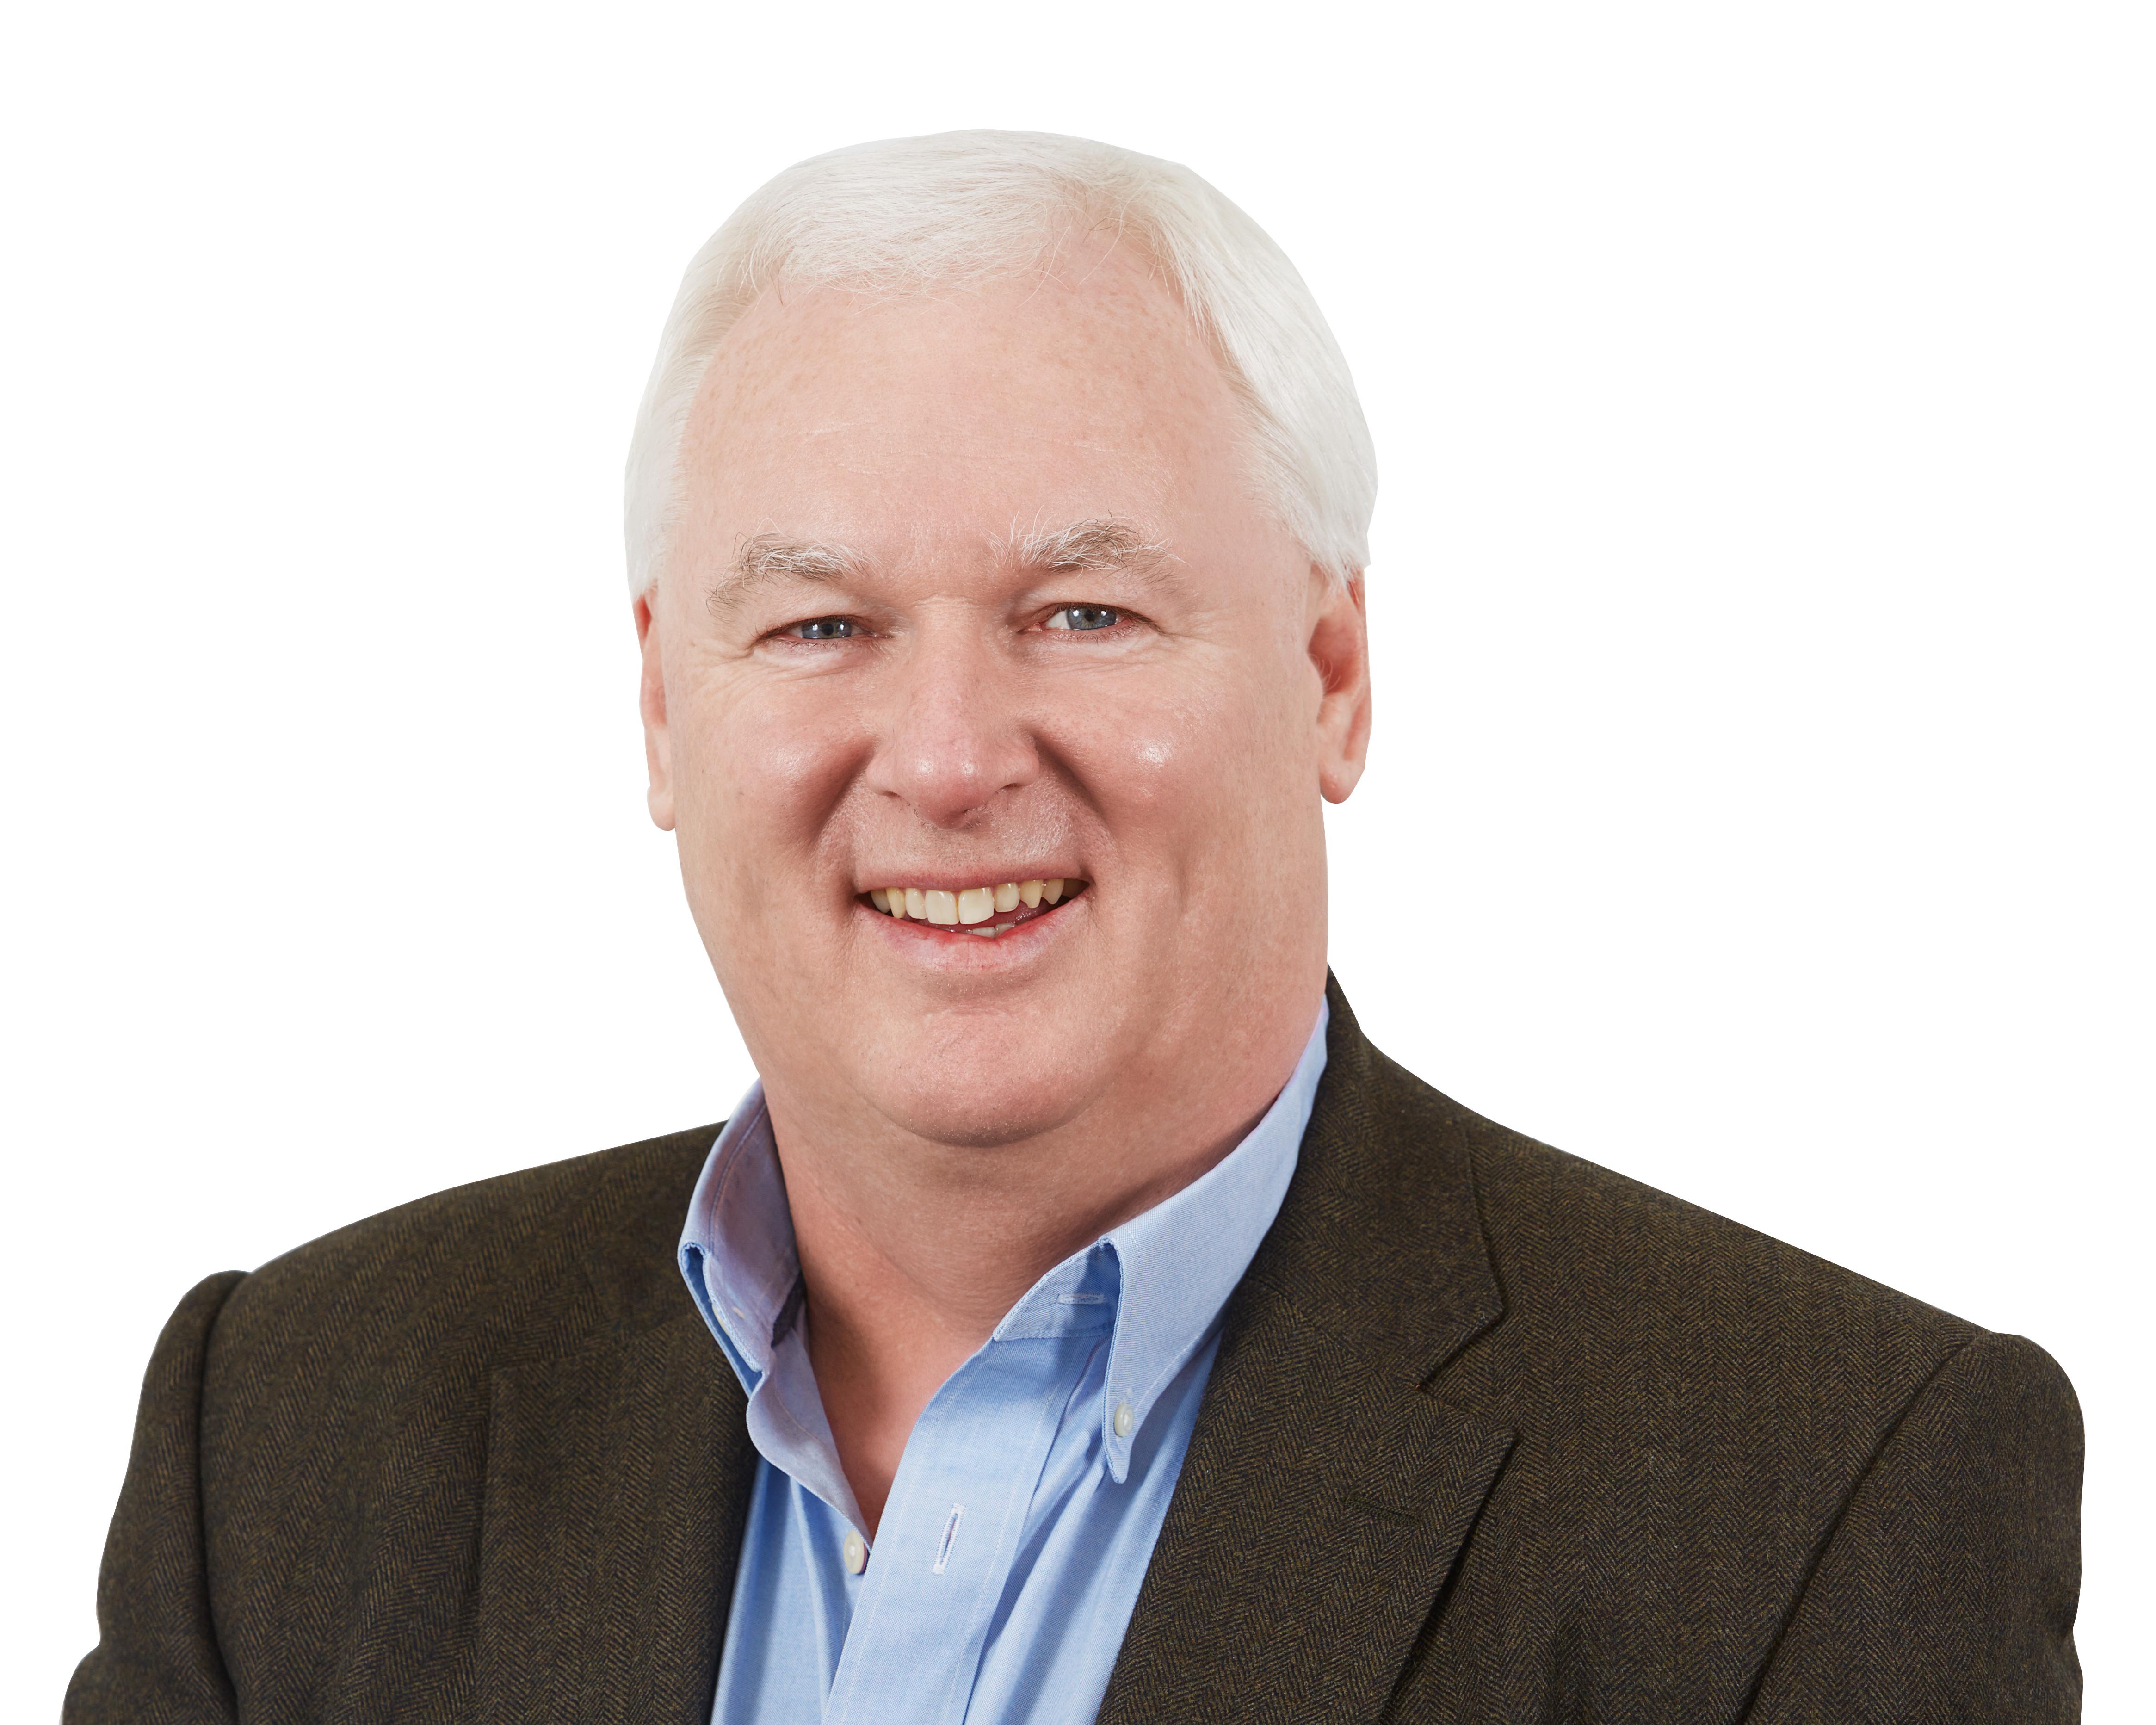 David Clayton, executive chairman at SDL